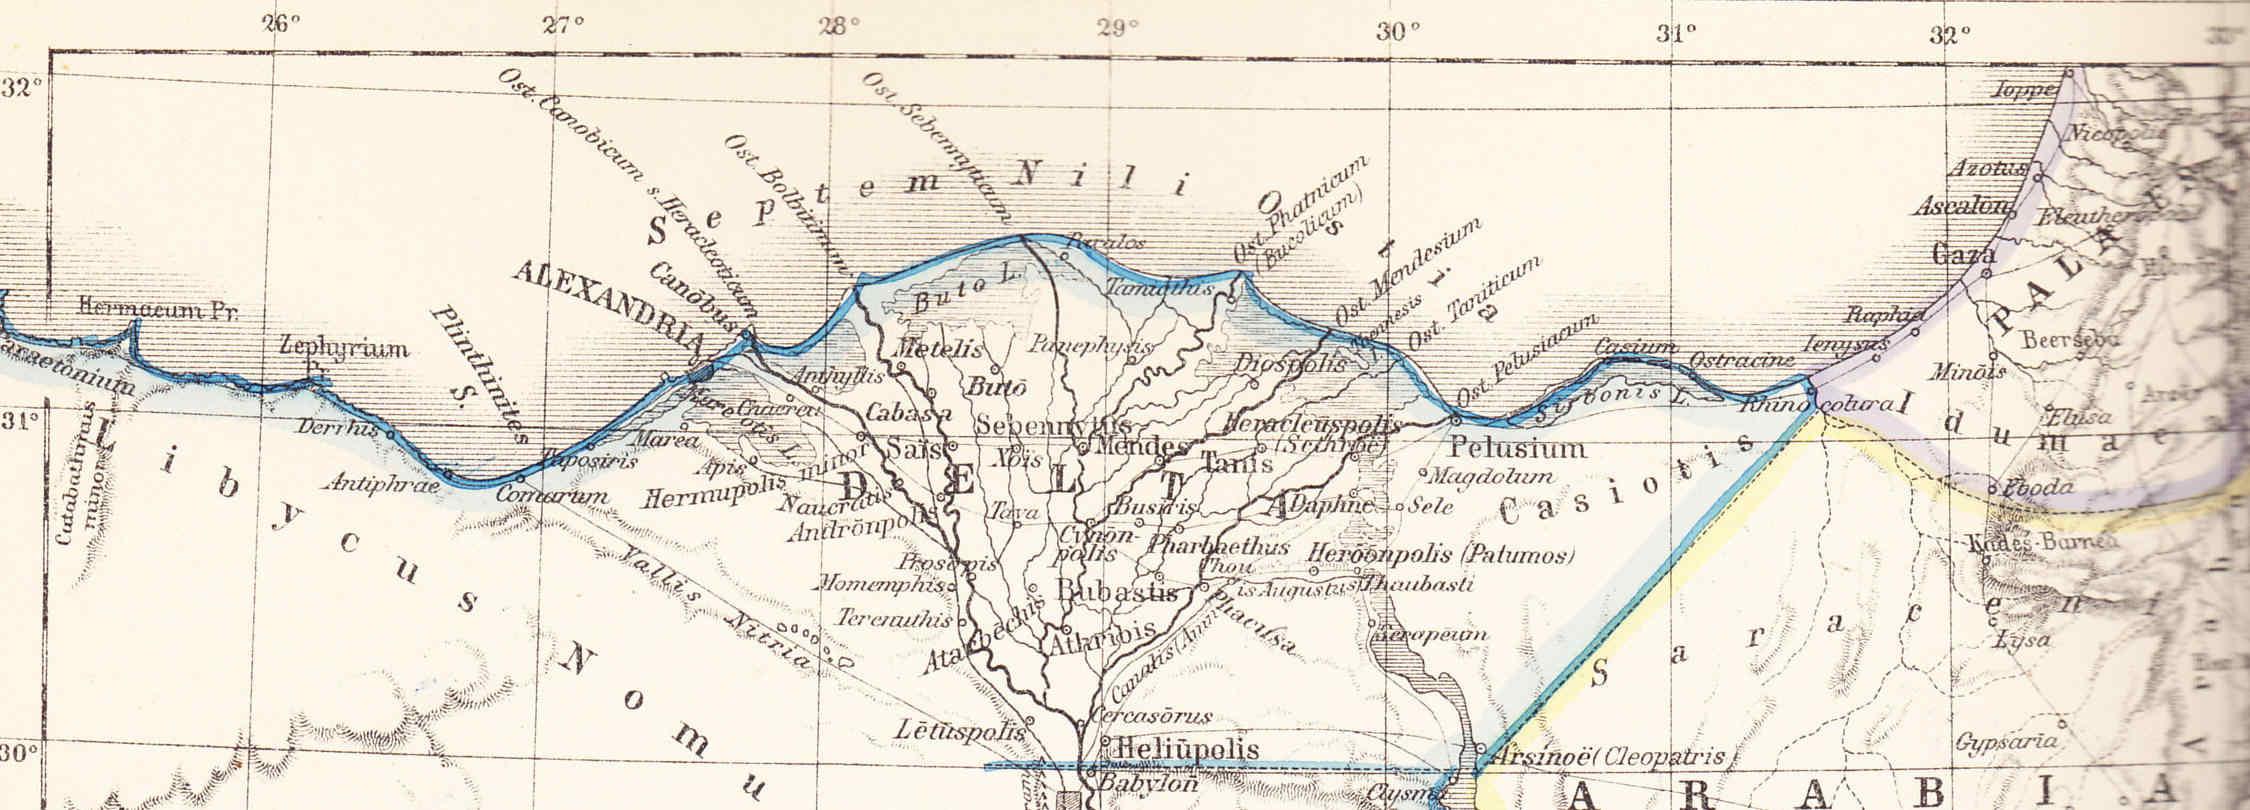 Egipto antiguo 34 y Ptolomeo V Epifanes 1